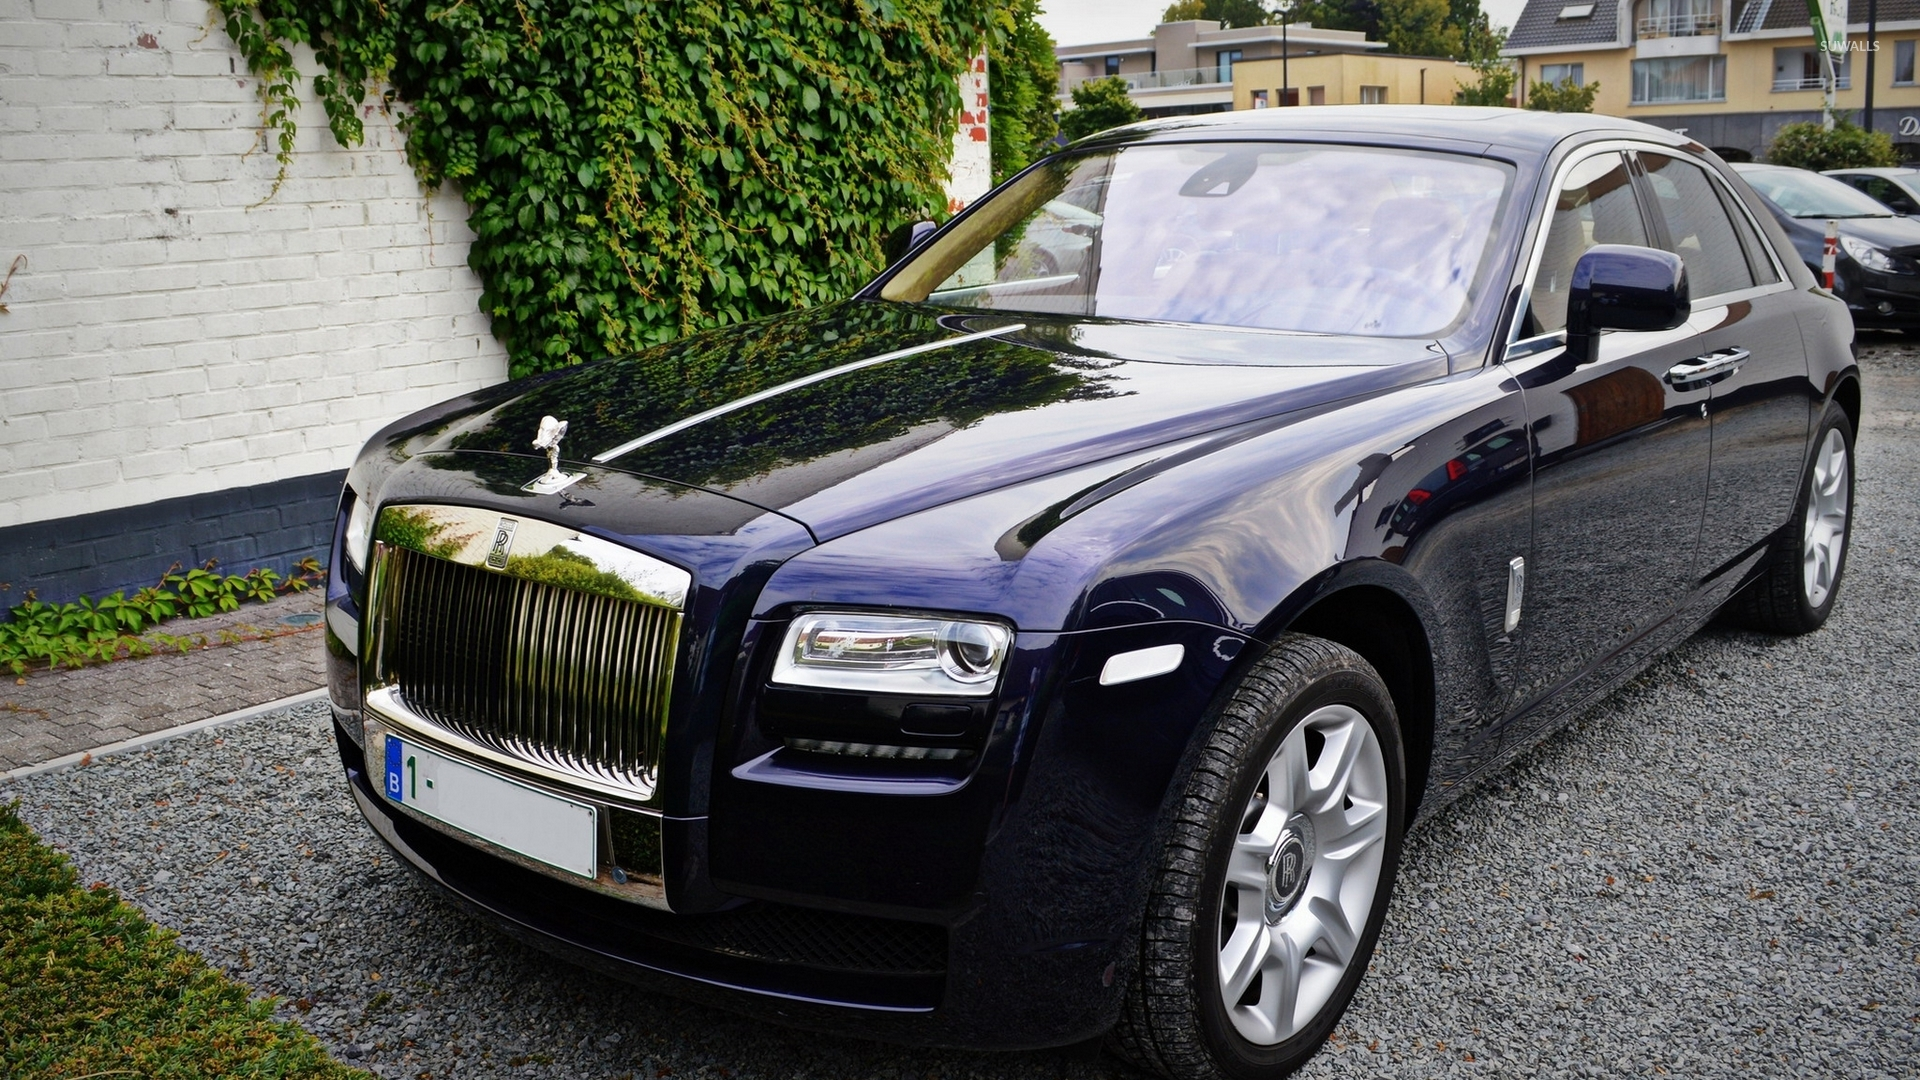 Rolls-Royce Phantom 4 wallpaper - Car wallpapers - #39340